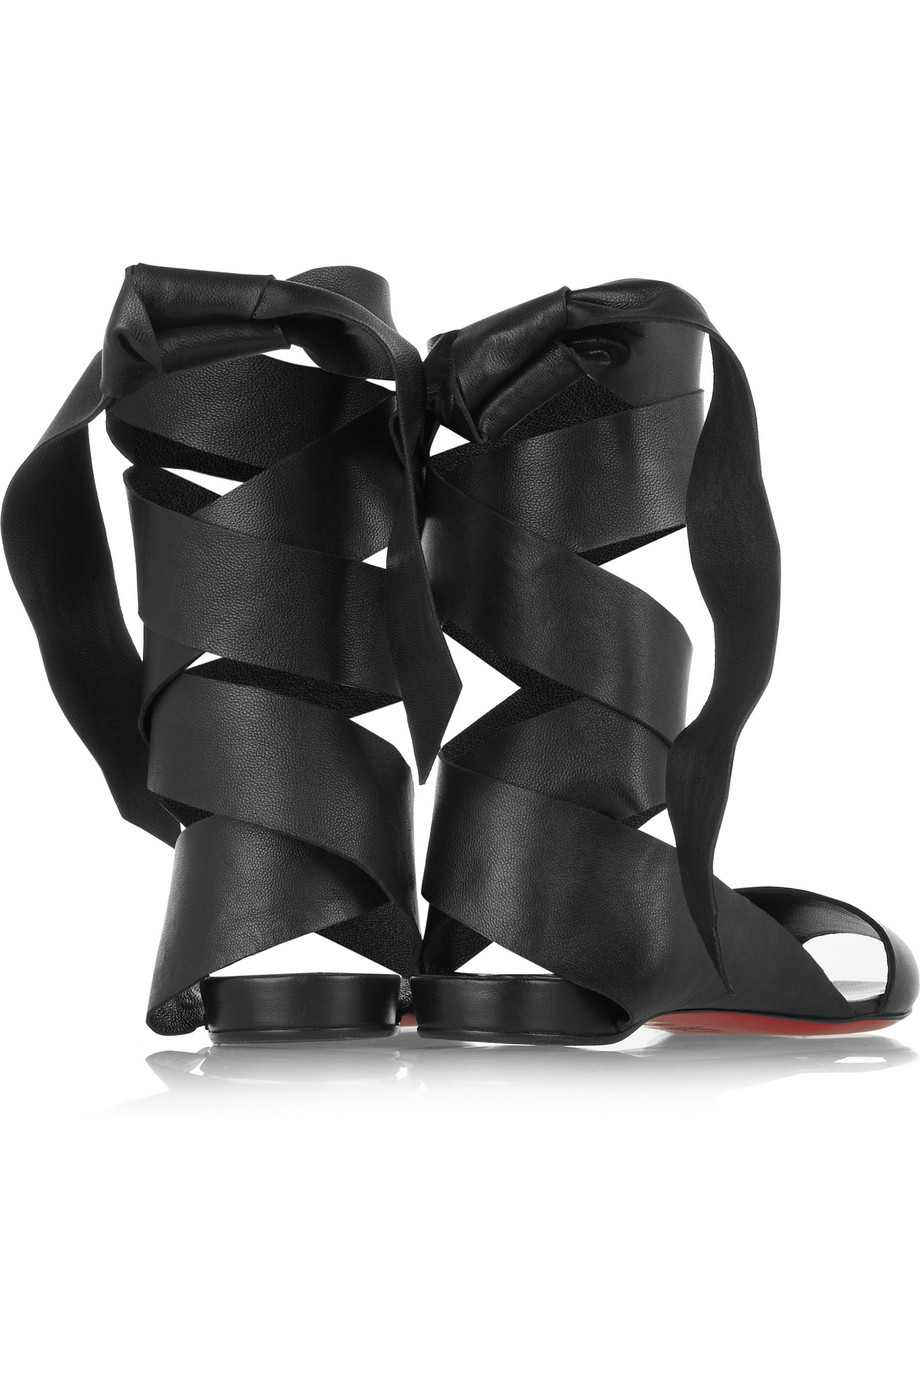 replica shoes christian louboutin - christian louboutin leather wrap-around sandals, mens black ...